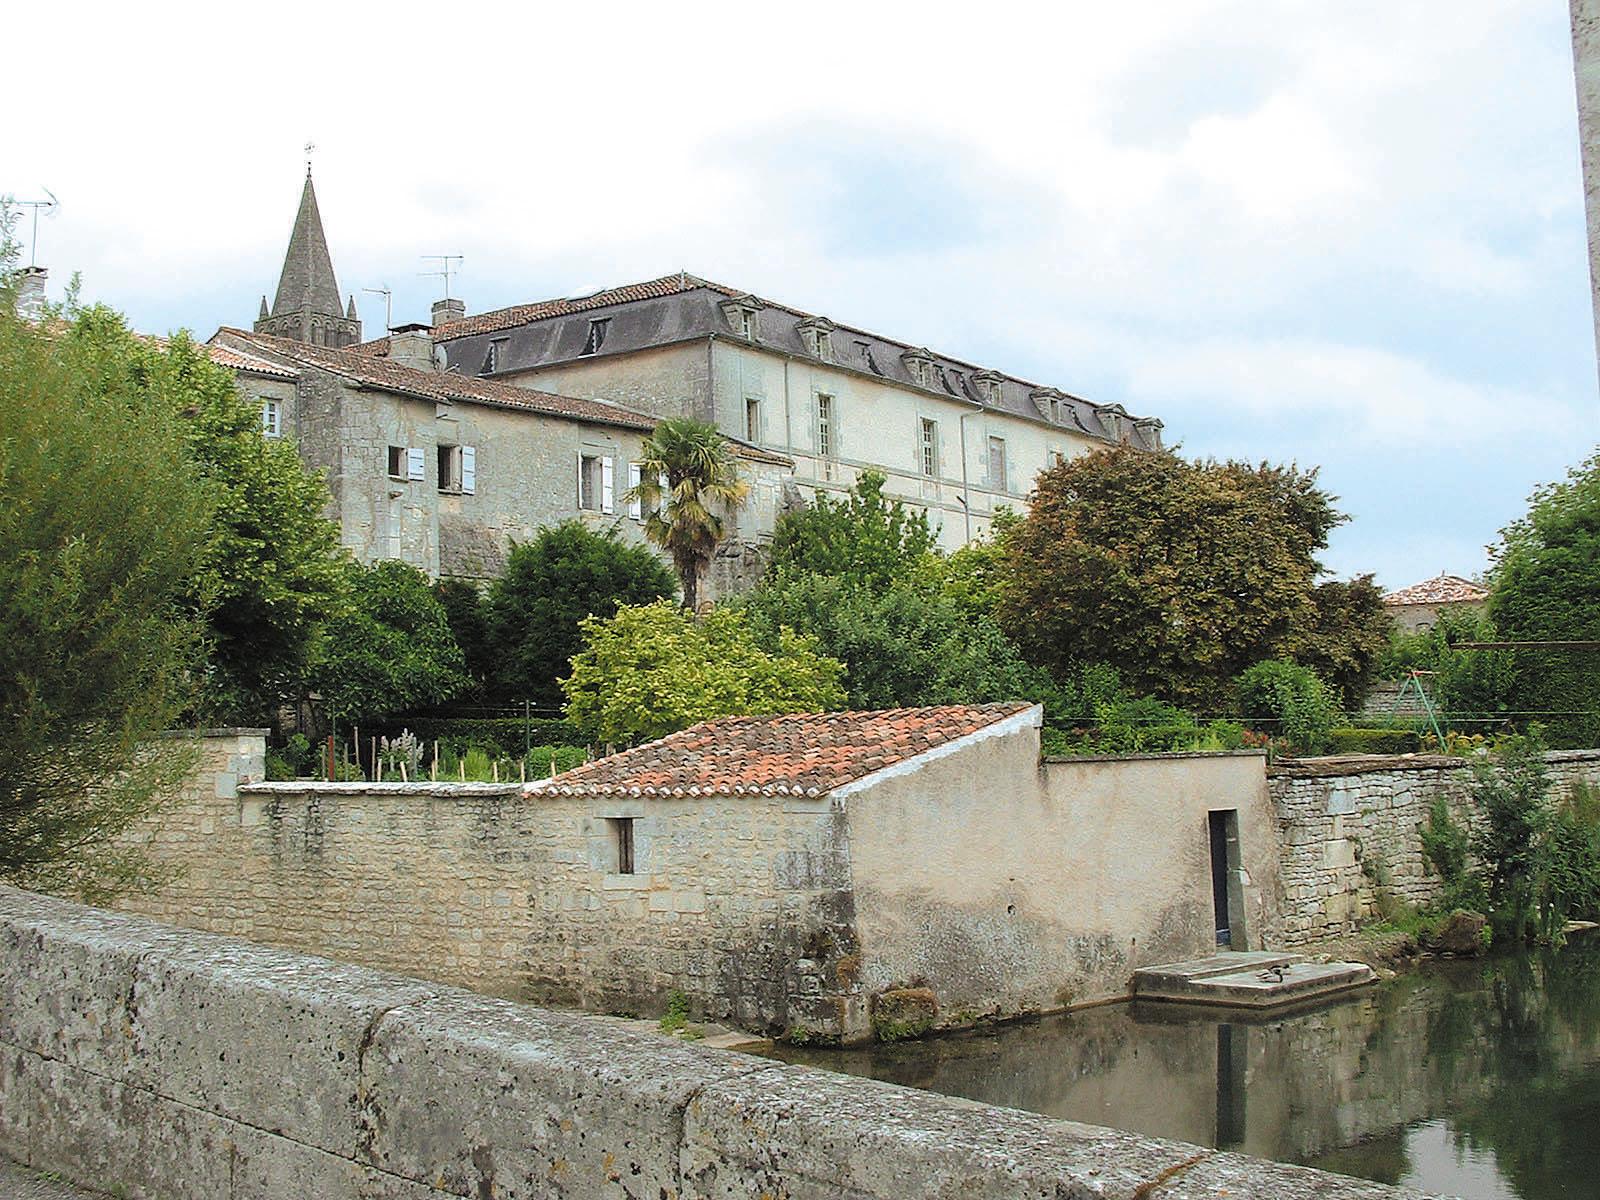 abbaye bassac charente en croisiere inter croisieres sireuil nicols 2959 charentestourisme.jpg